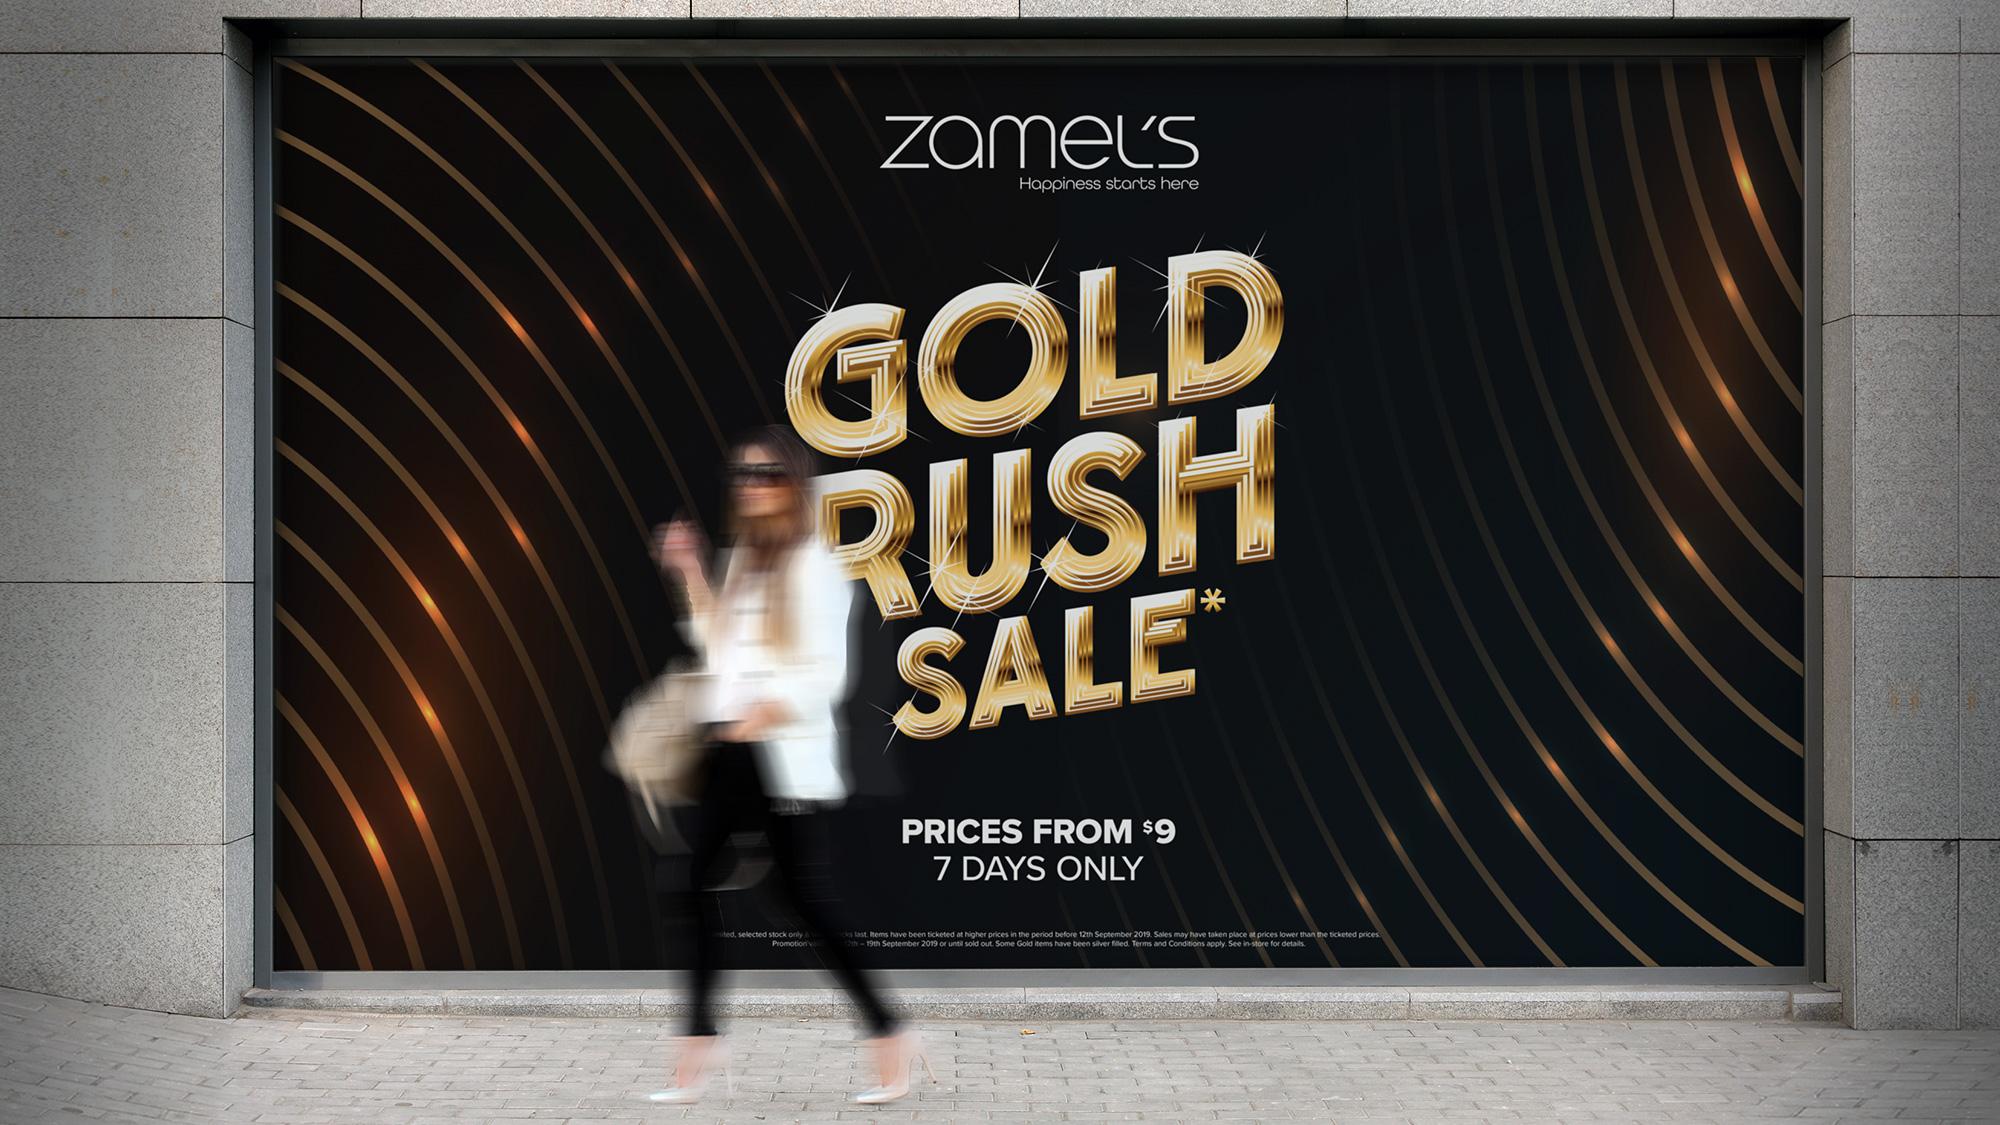 Zamel's Gold Rush Advertising Outdoor Window Decal